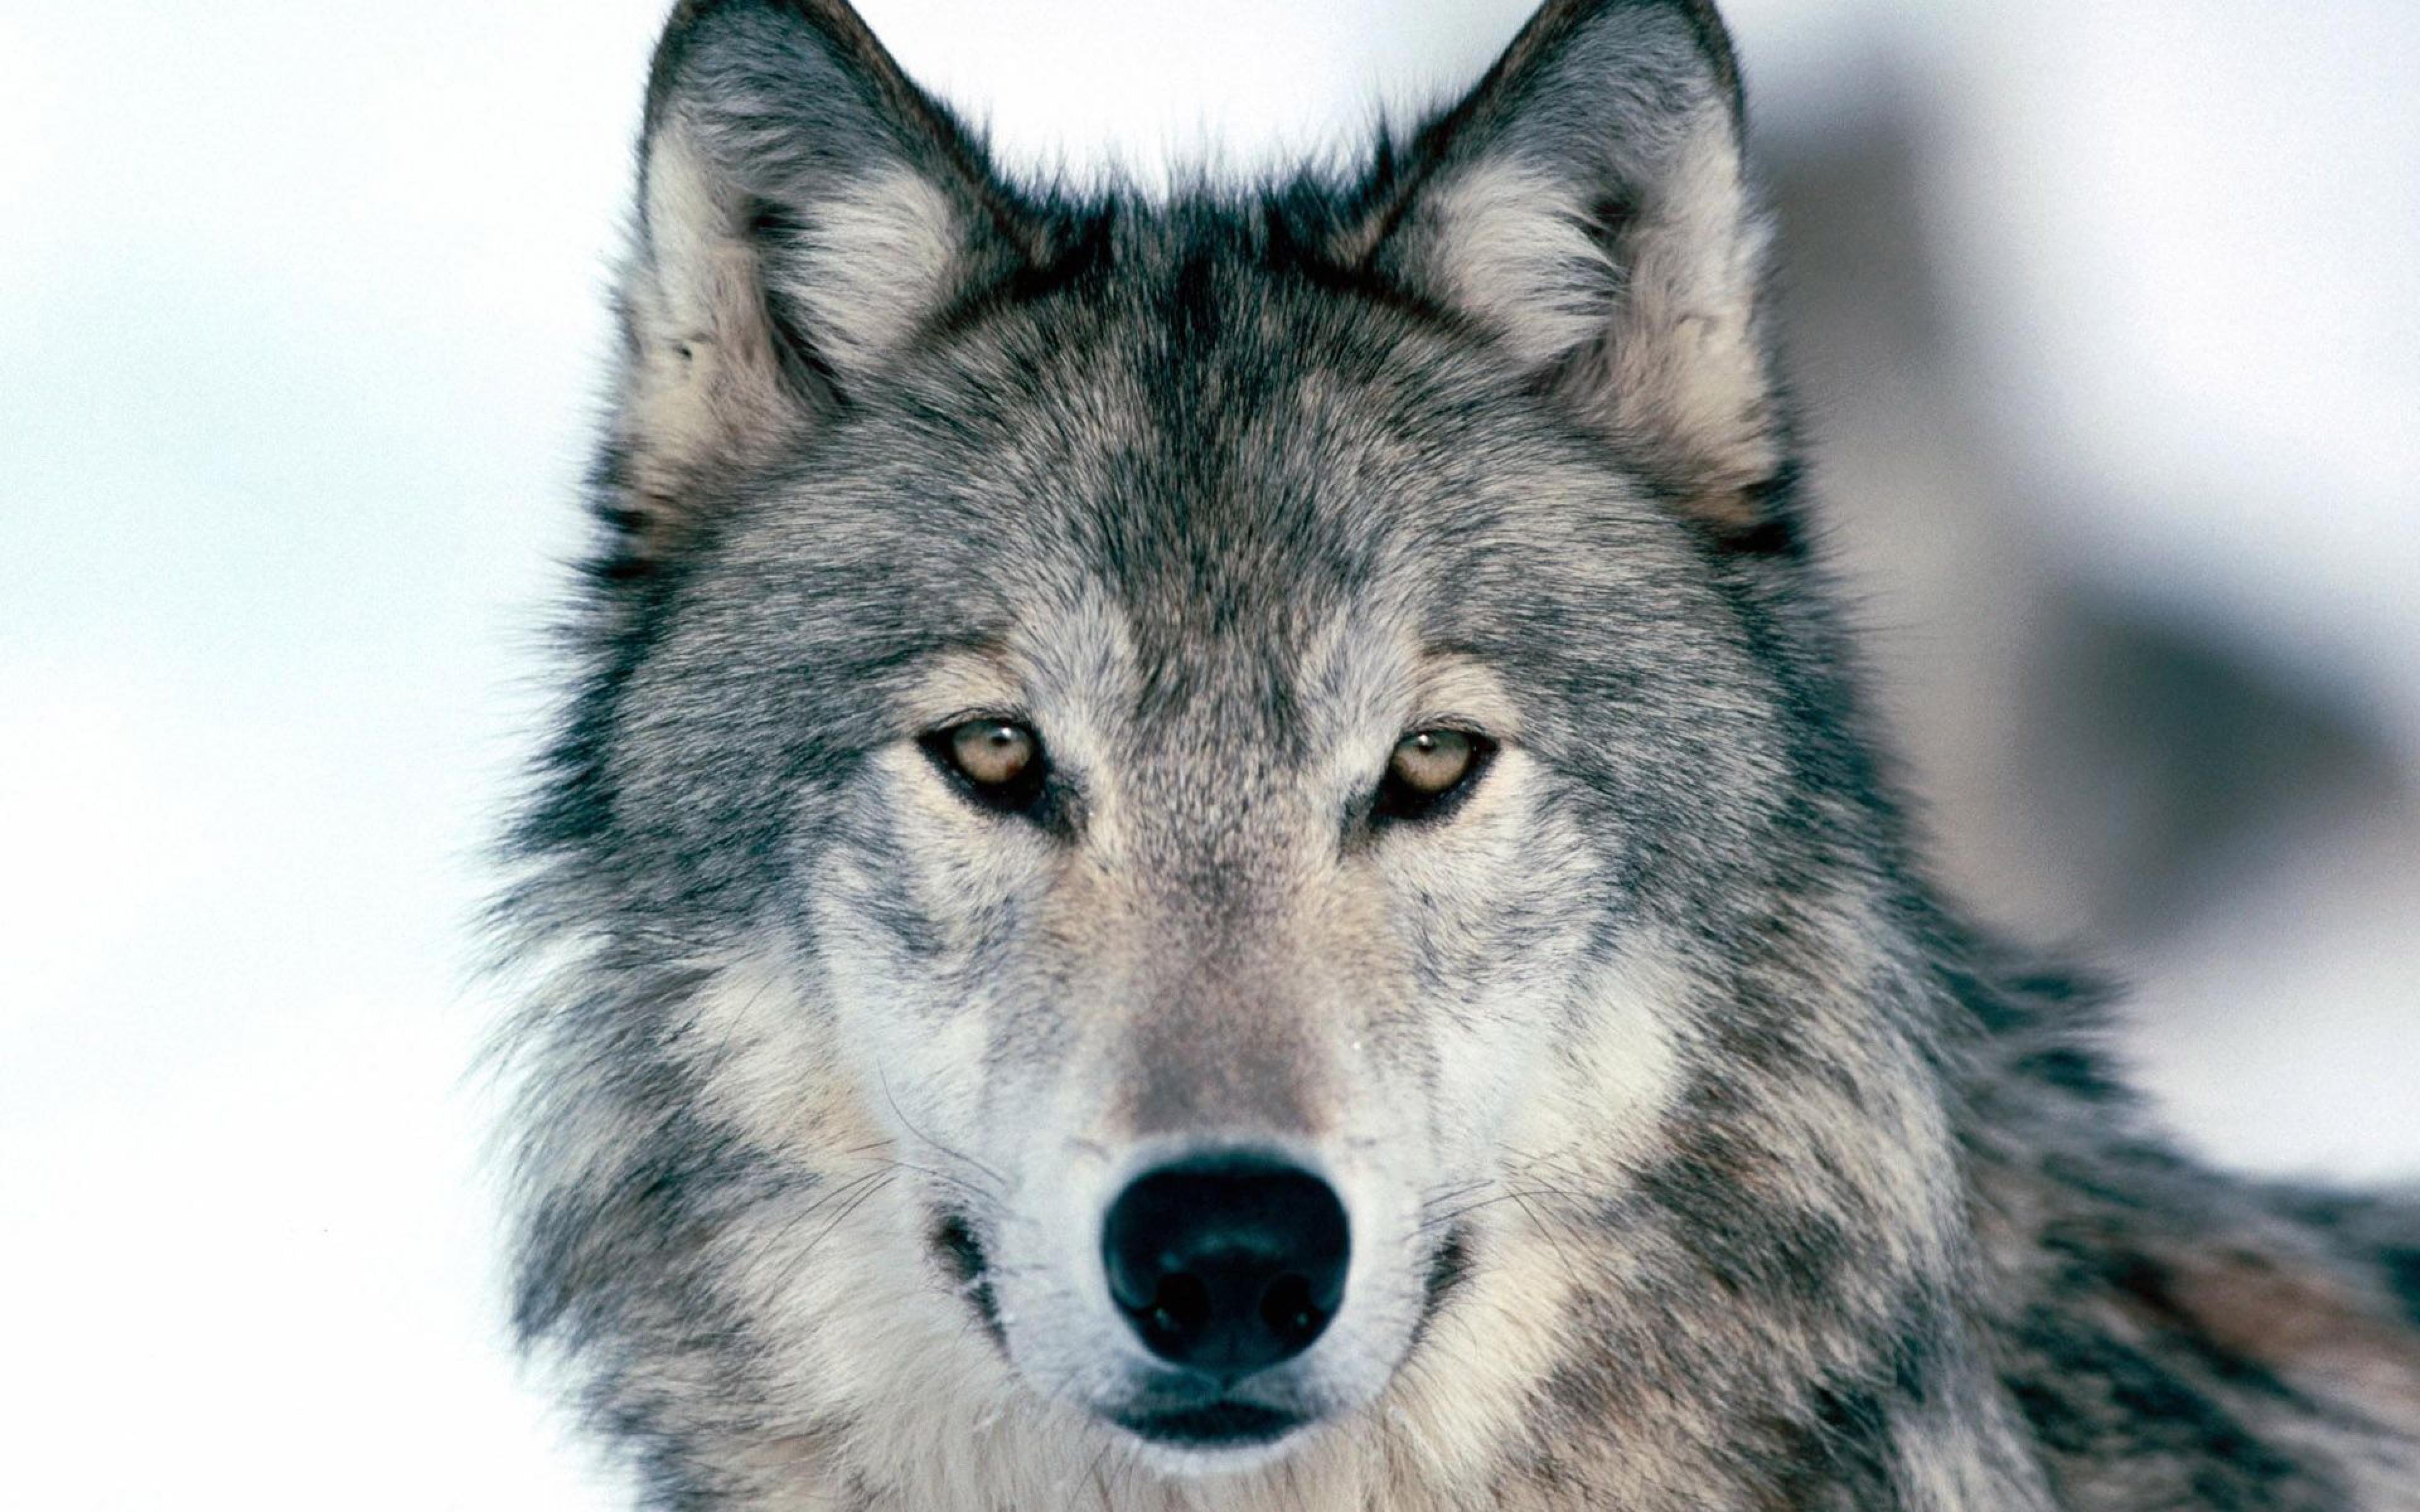 Download Wallpaper 3840x2400 wolf winter snow face eyes predator 3840x2400